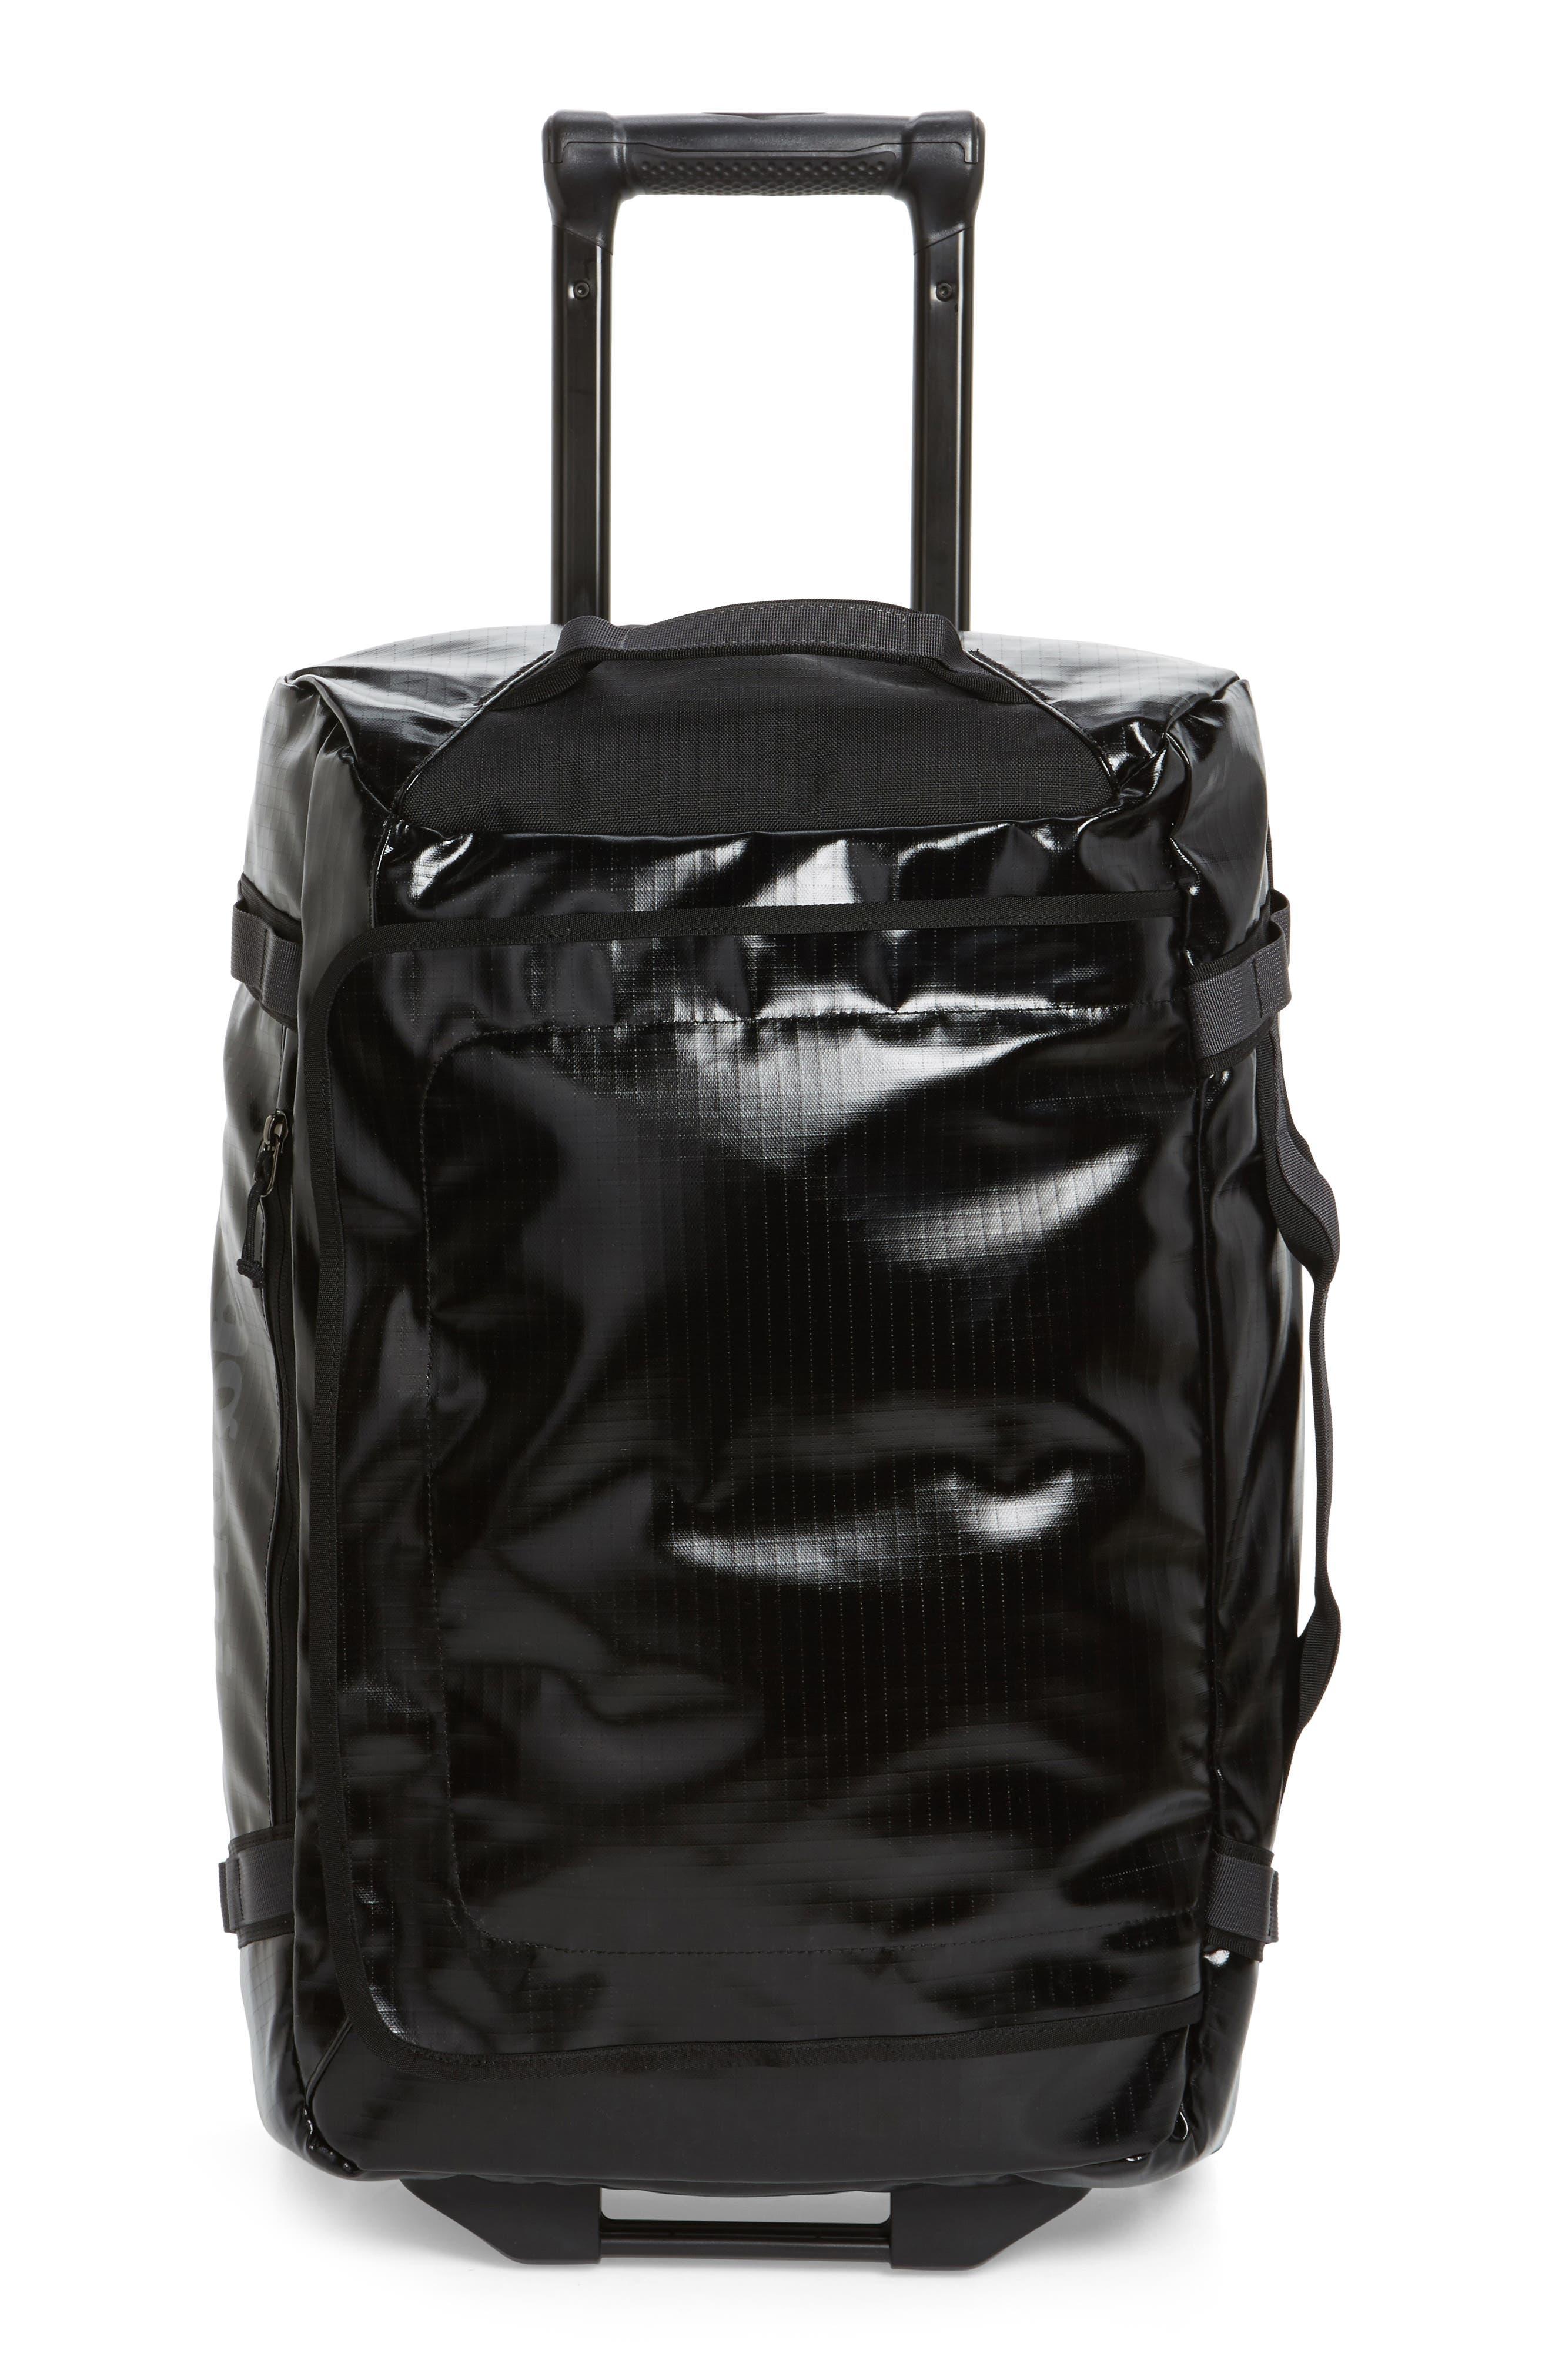 Patagonia Black Hole 40-Liter Rolling Duffel Bag